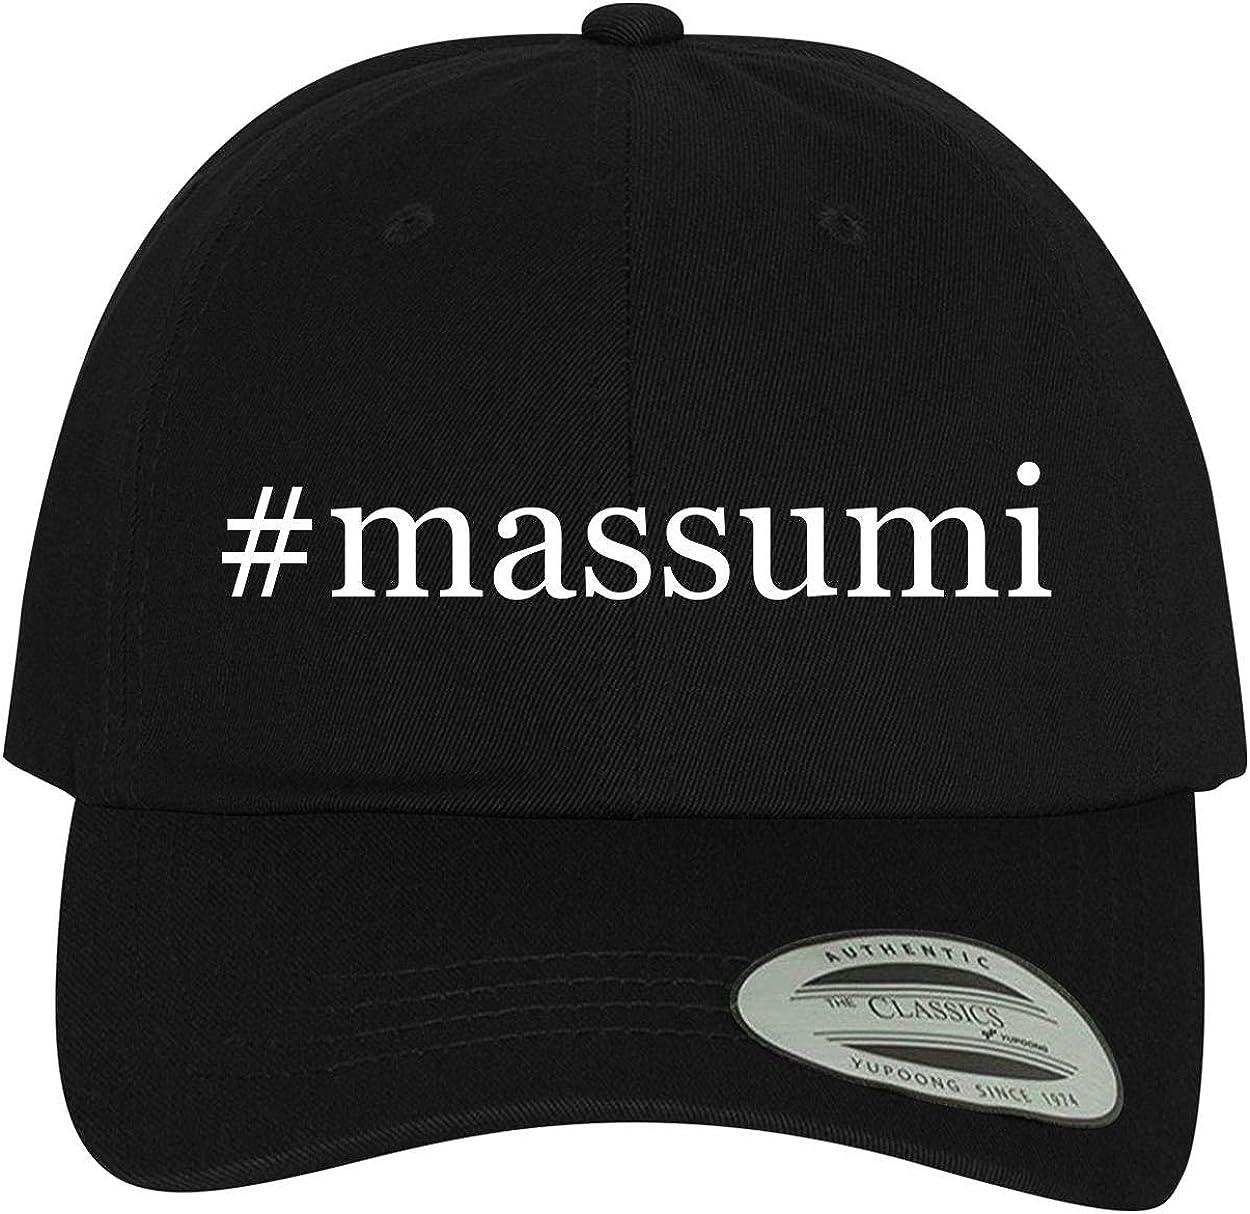 BH Cool Designs #Massumi Comfortable Dad Hat Baseball Cap